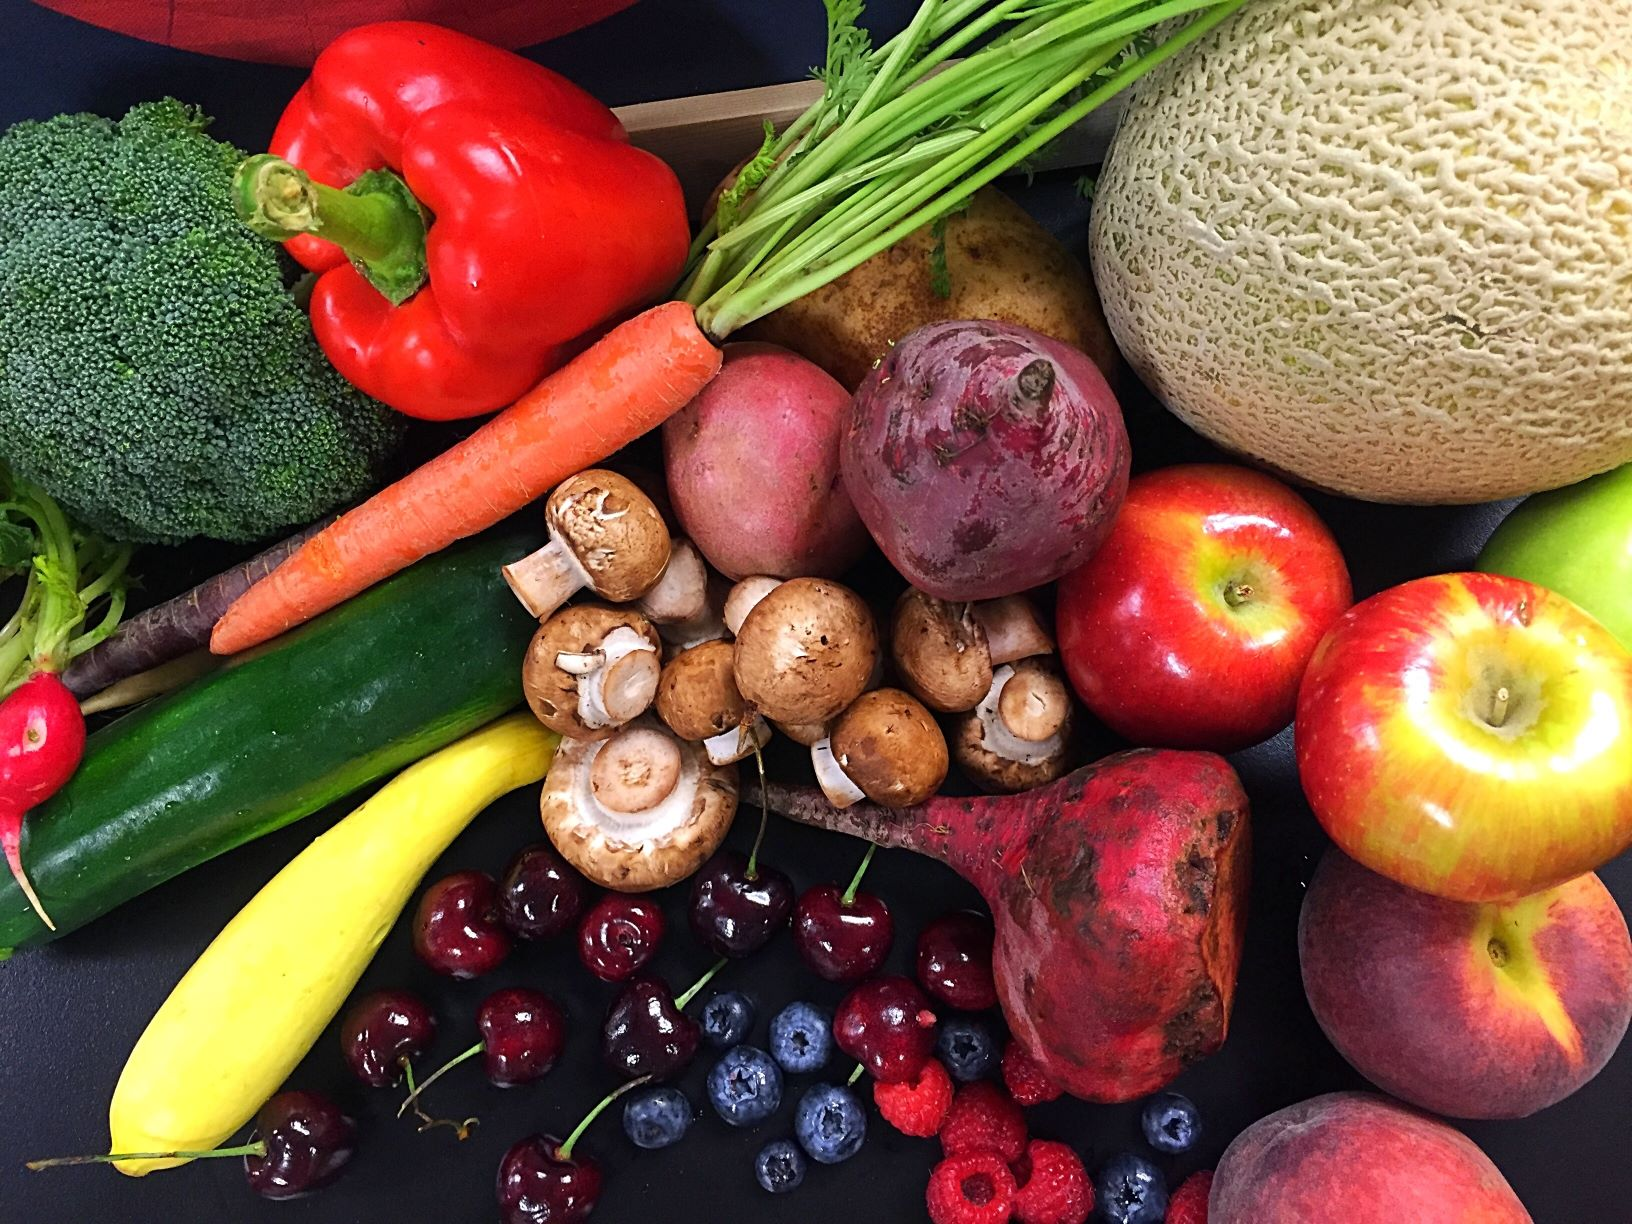 Food Justice Symposium